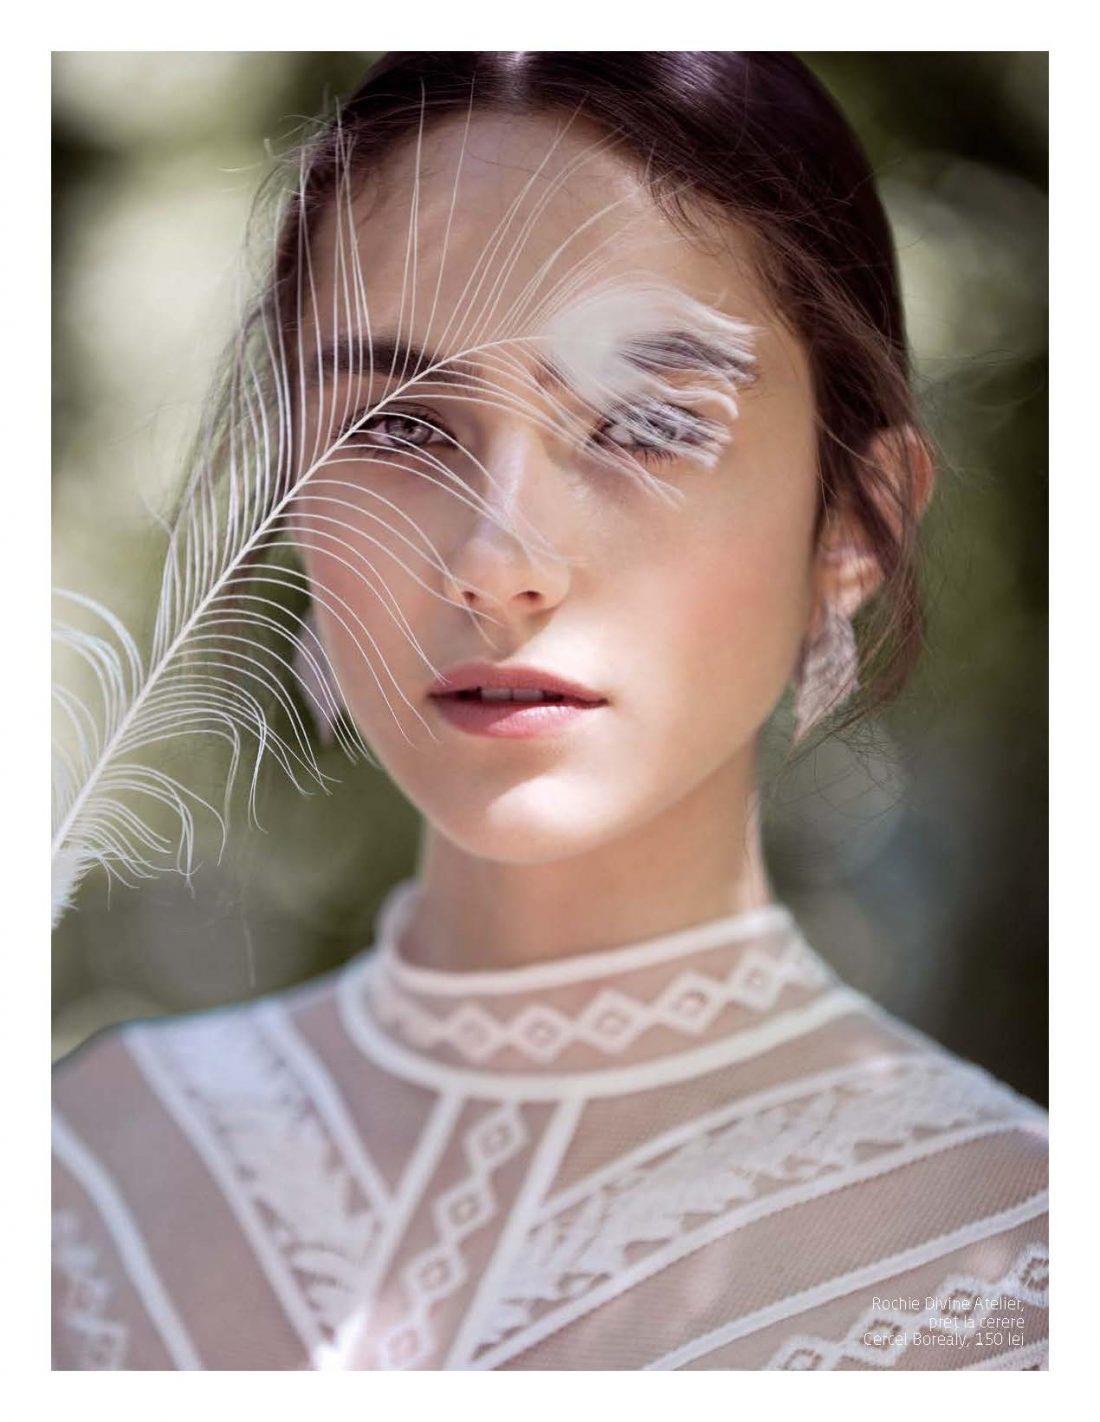 Beau Monde Mirese - Belle de jour | Tania Cozma makeup